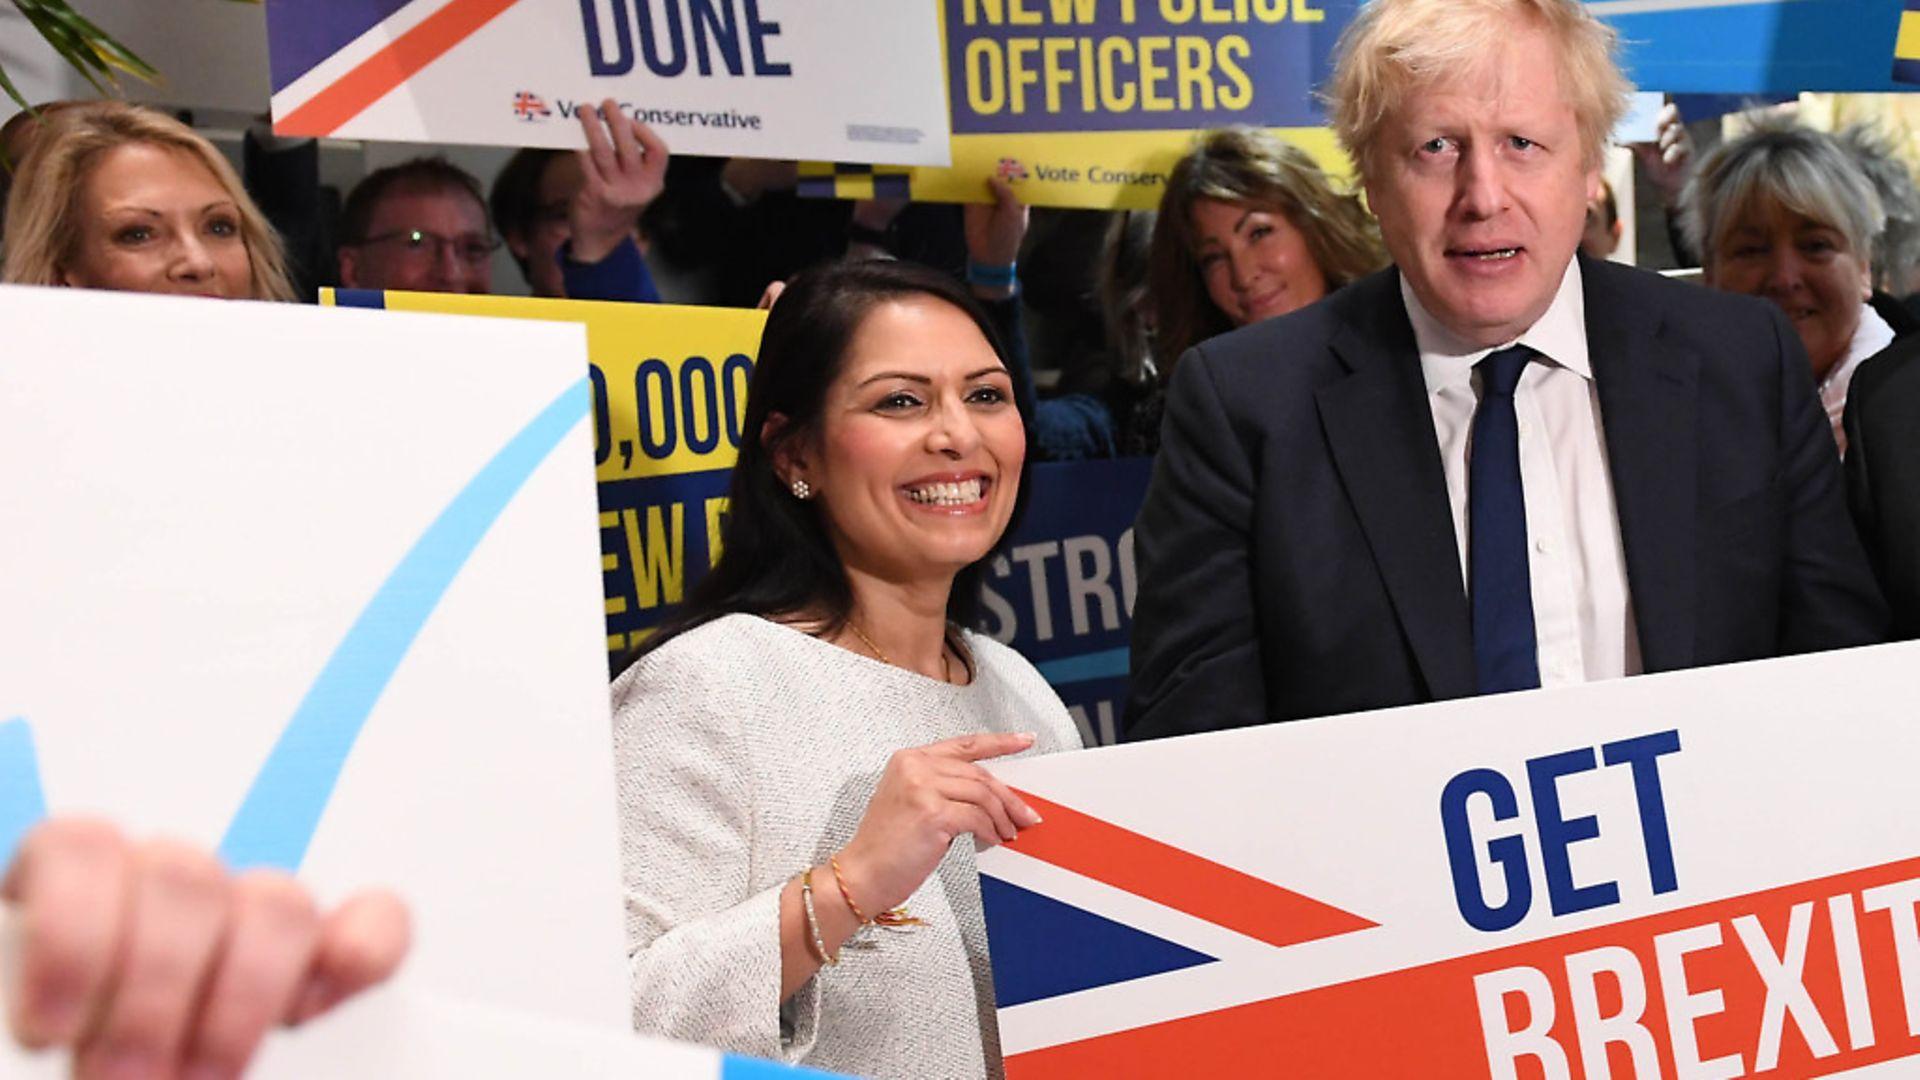 Prime minister Boris Johnson and home secretary Priti Patel. Photograph: Stefan Rousseau/PA Wire. - Credit: PA